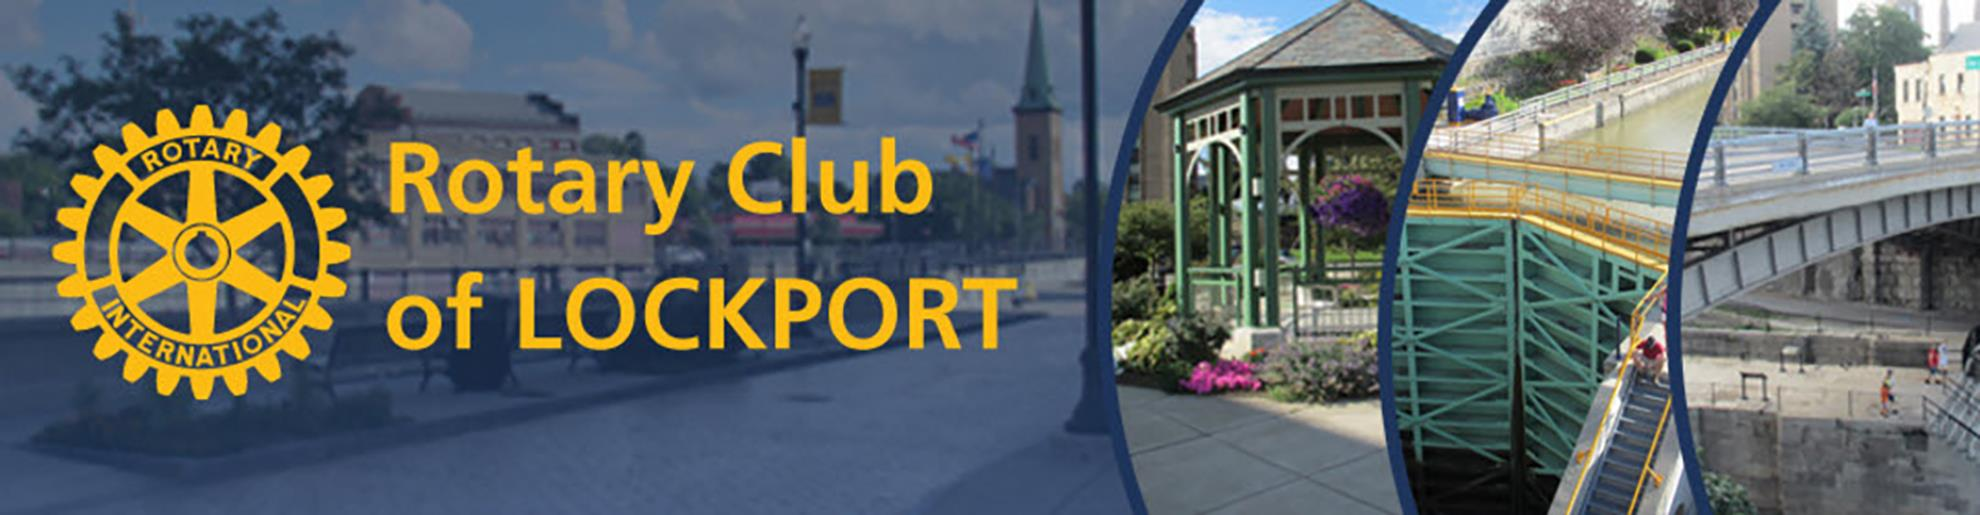 Rotary Club of Lockport